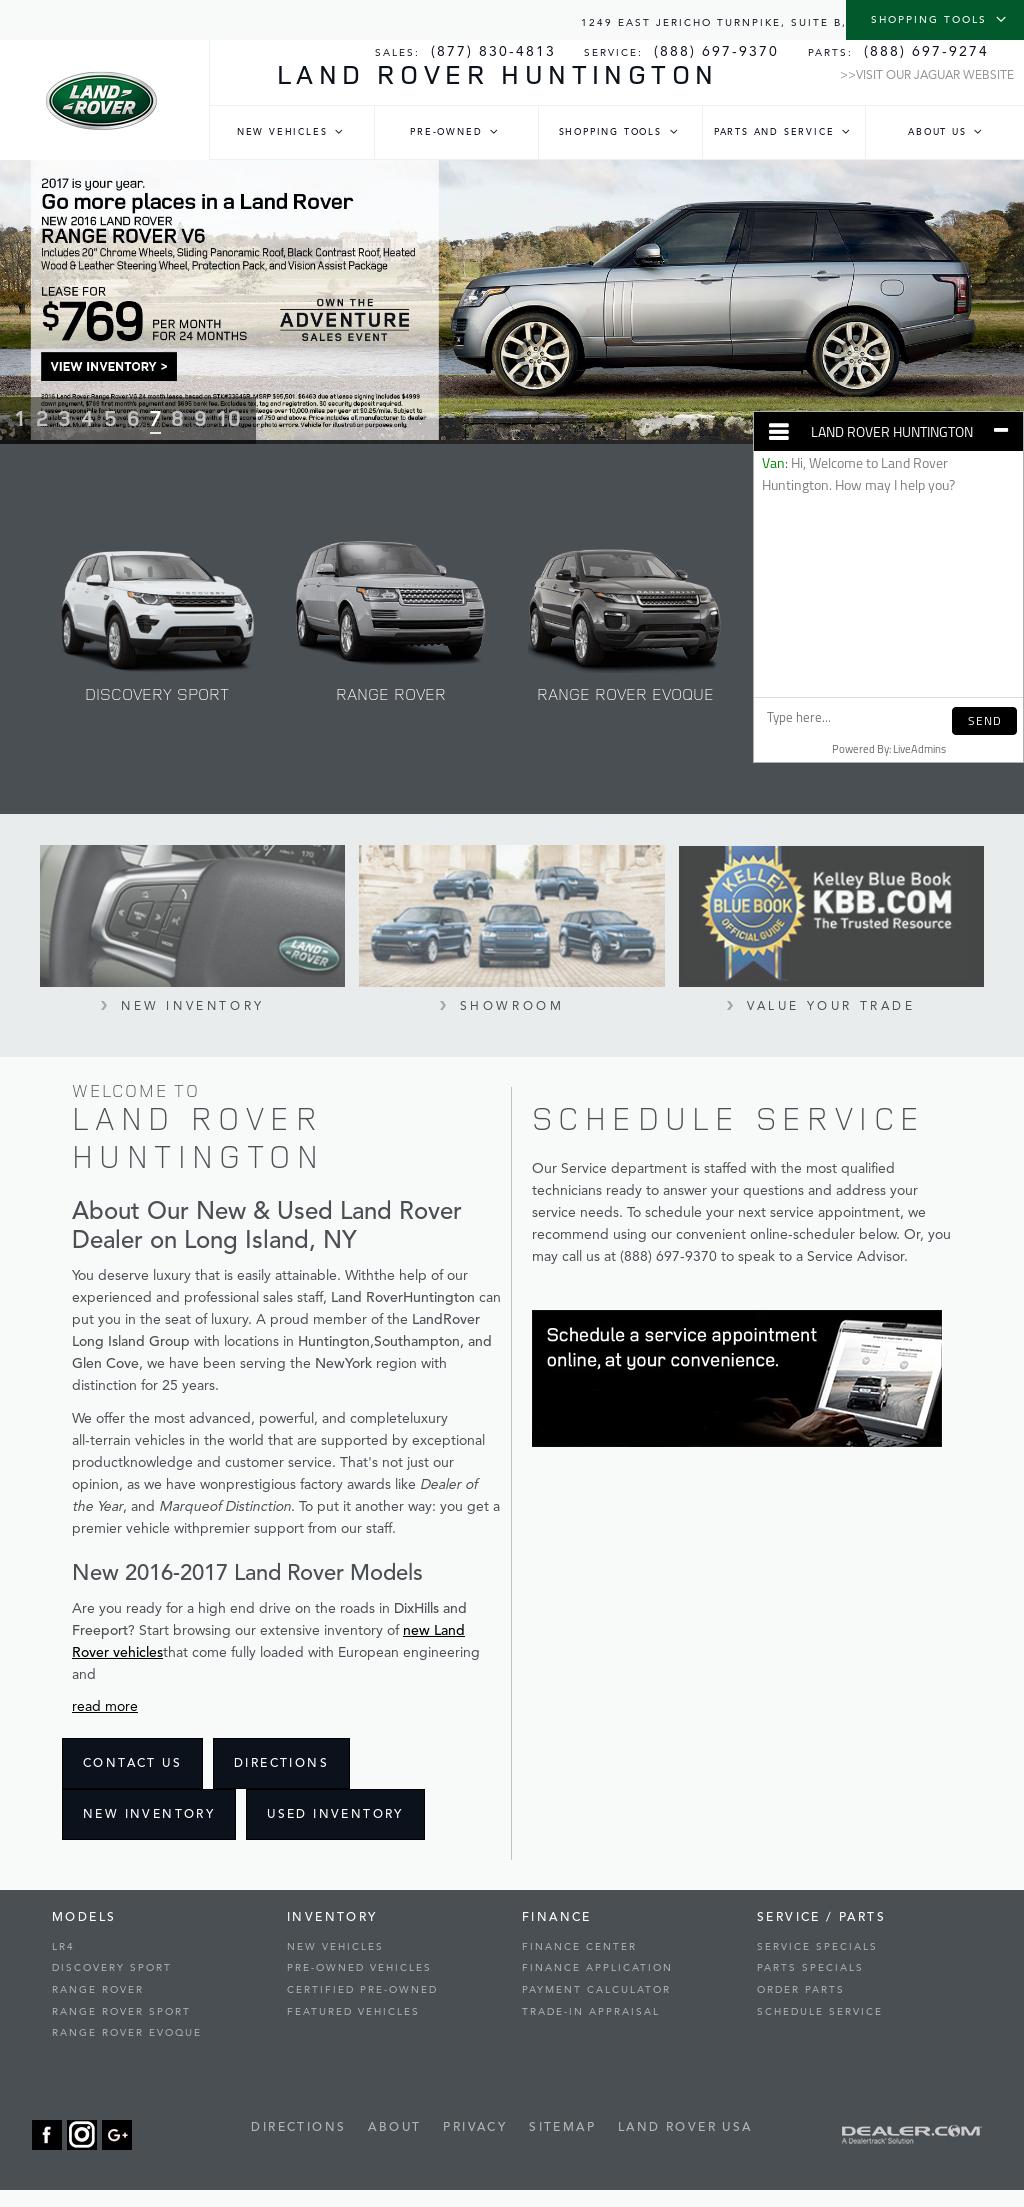 Range Rover Huntington >> Jaguar Land Rover Huntington Competitors Revenue And